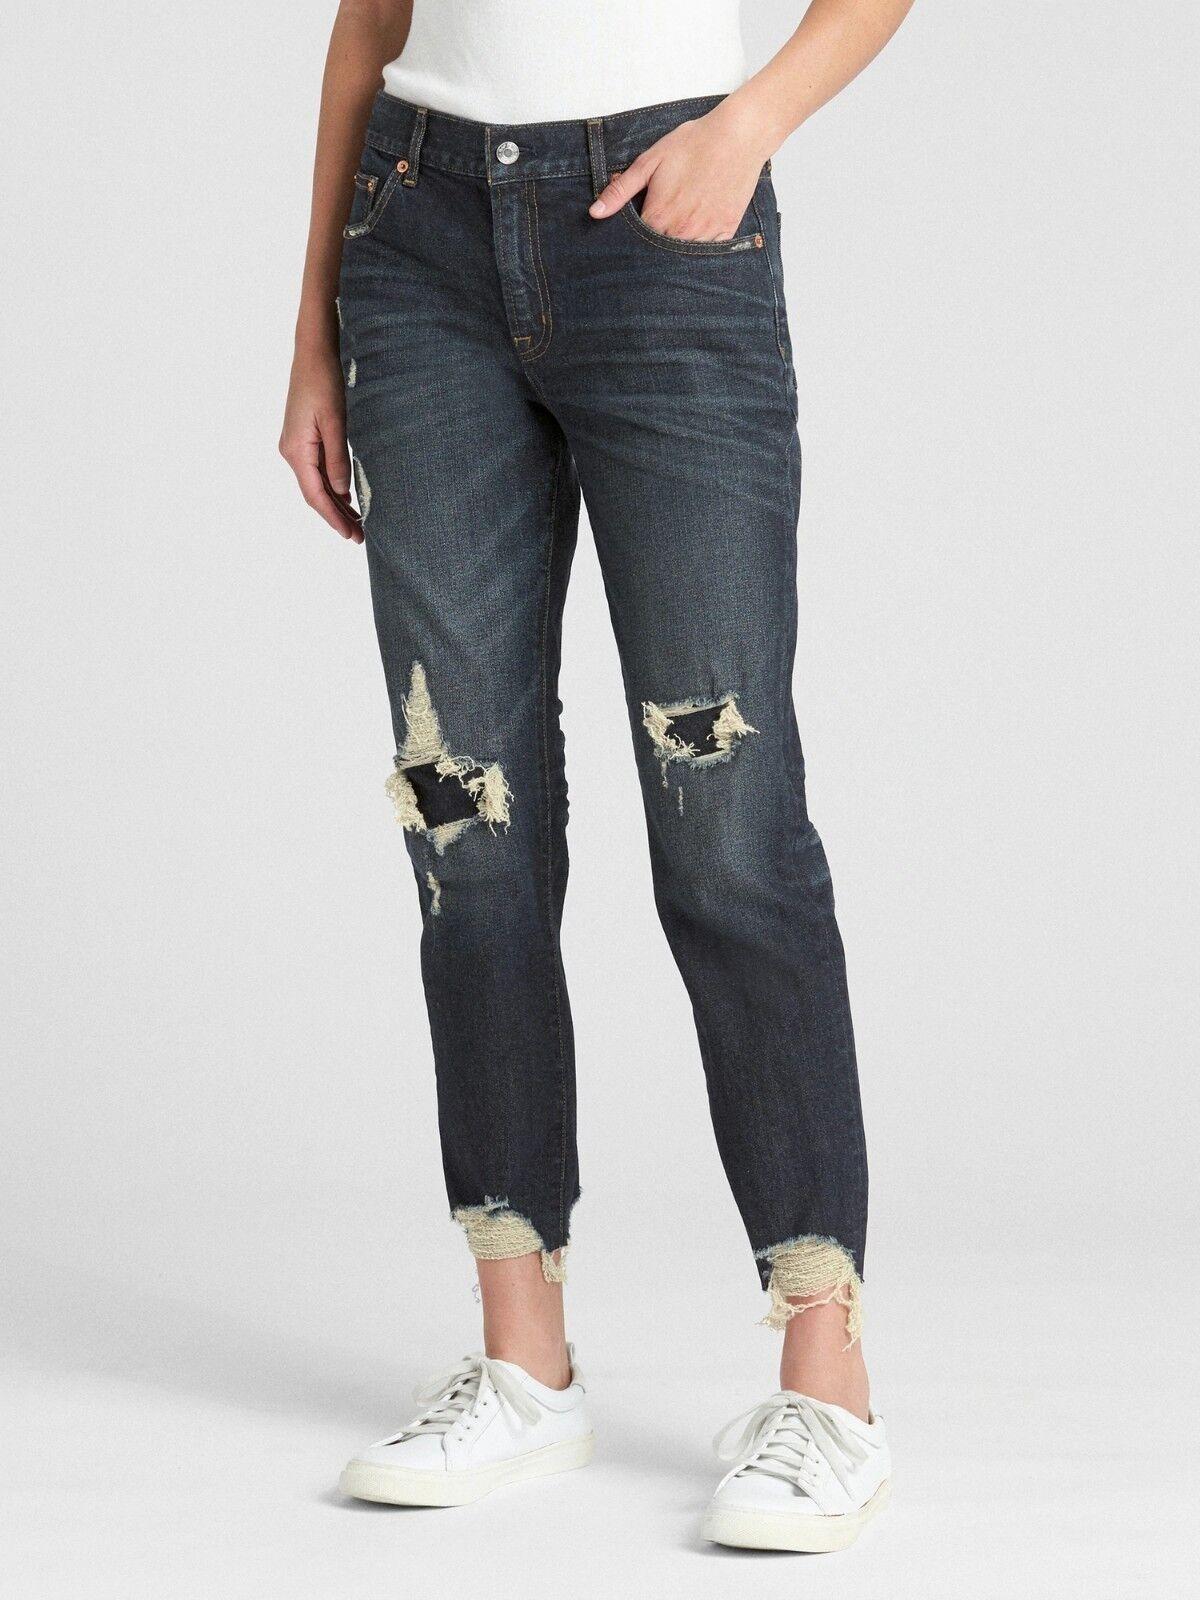 Gap Mid Rise Girlfriend Jeans in Distressed, Dark Indigo SIZE 27   N0103